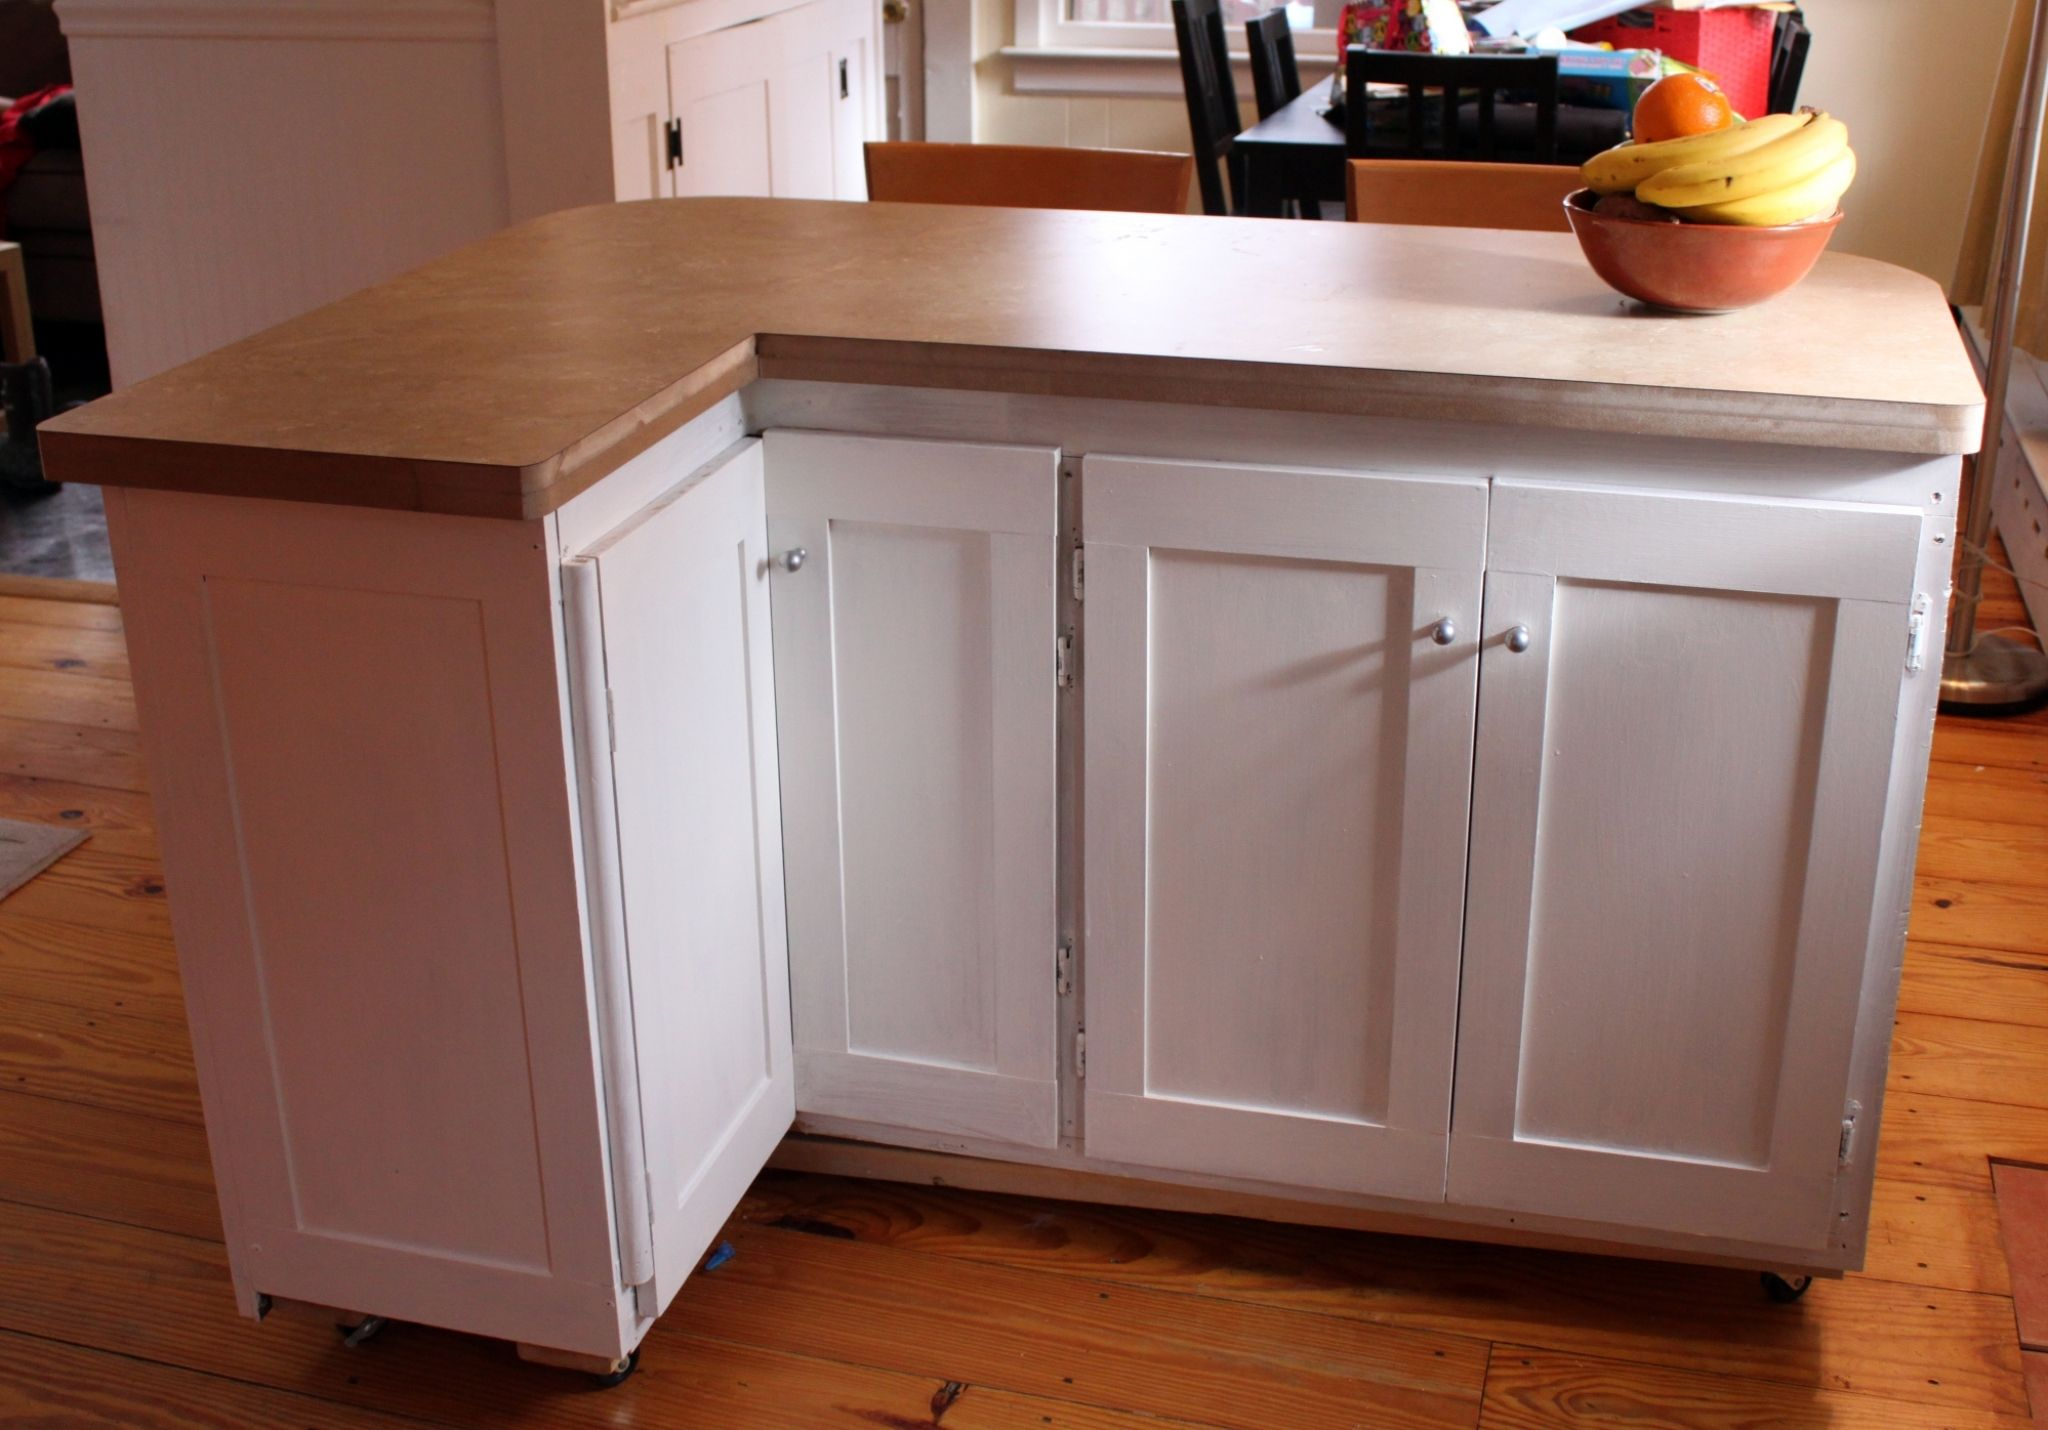 Scintillating Rolling Kitchen Cabinet | Swing Kitchen